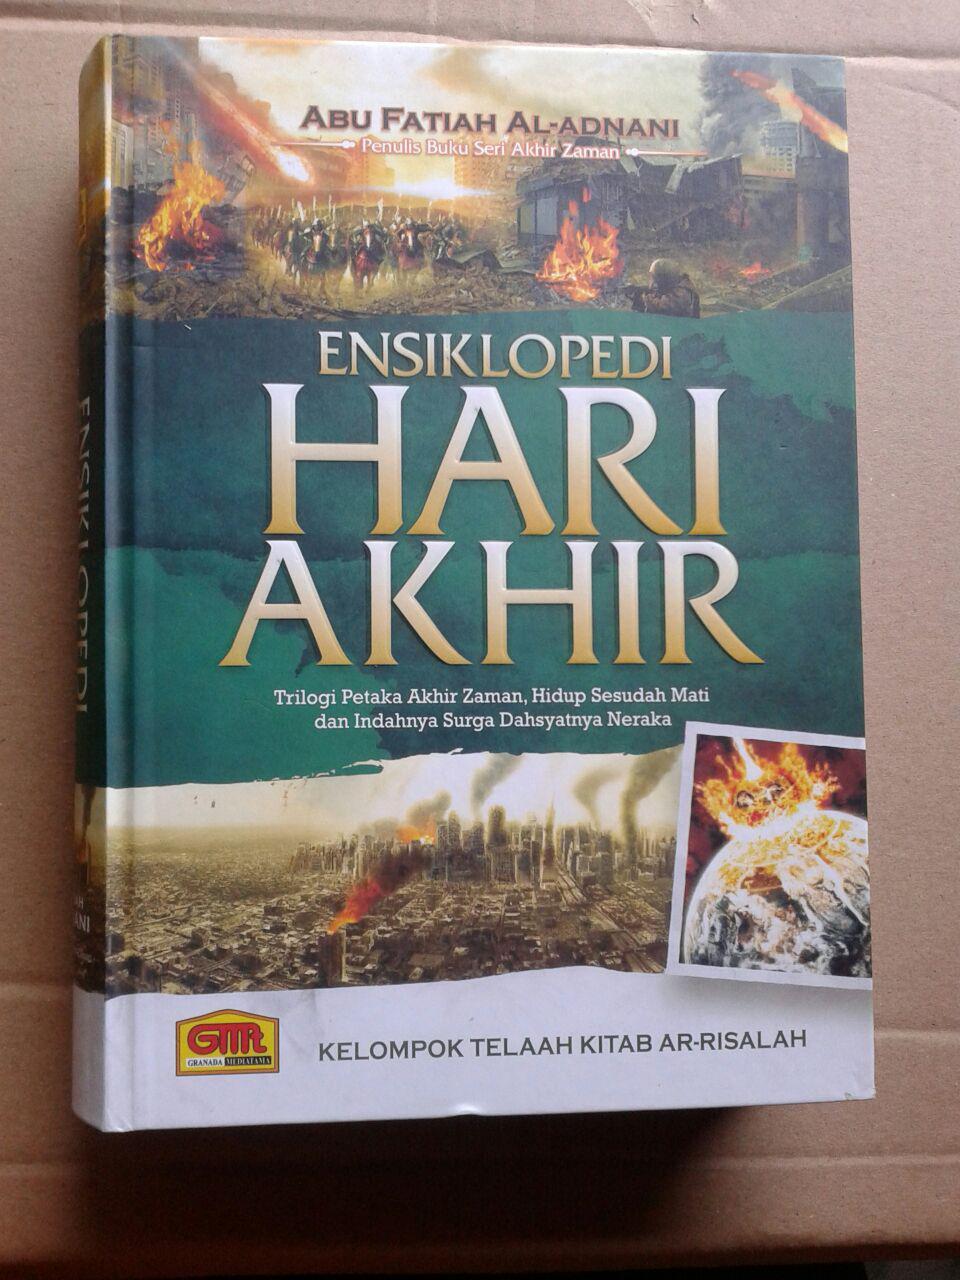 Buku Ensiklopedi Hari Akhir Trilogi Petaka Akhir Zaman cover